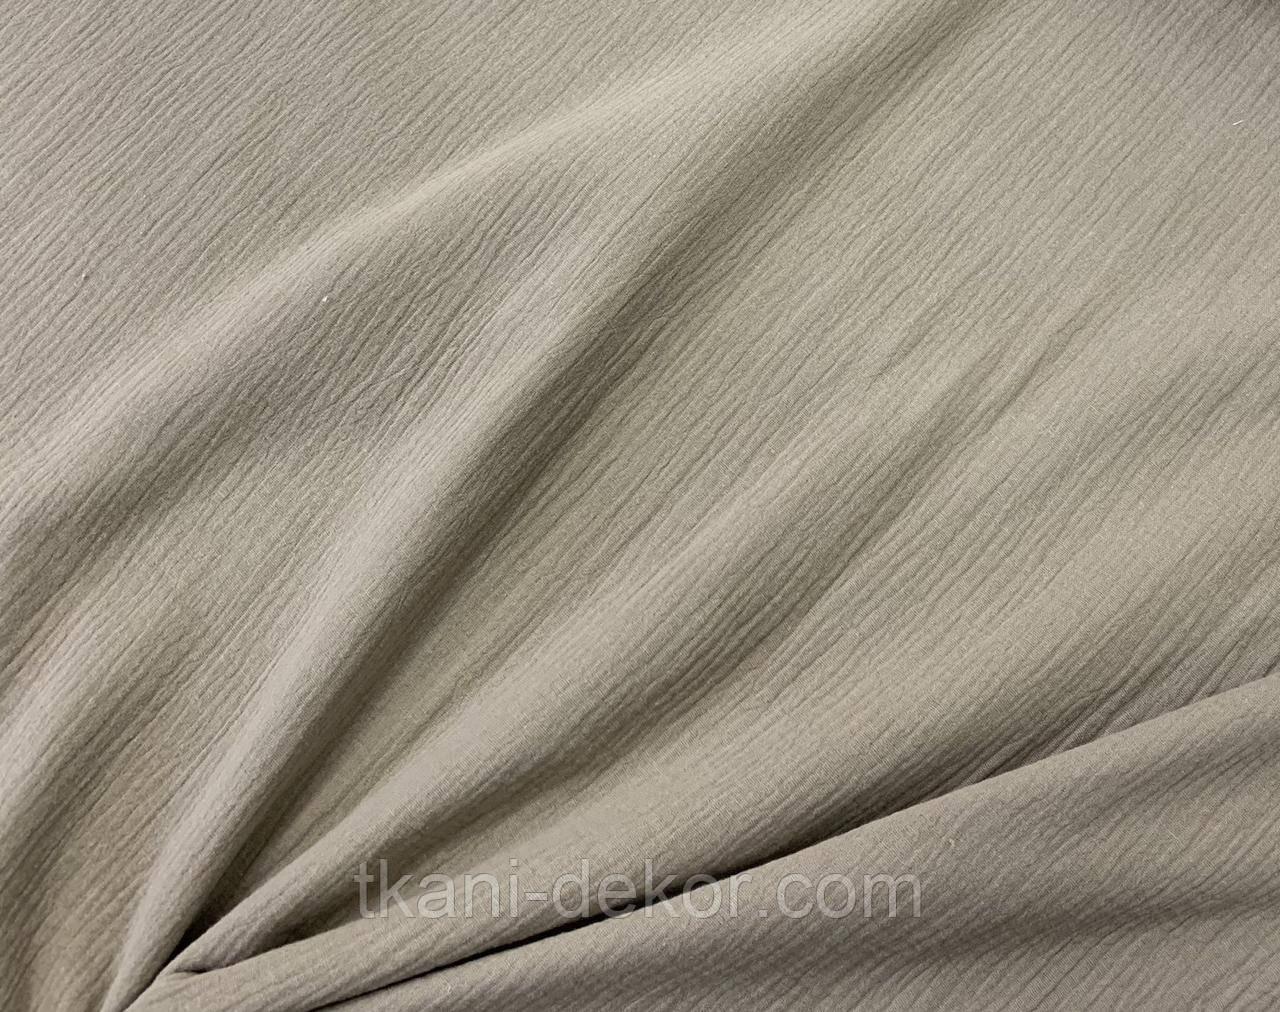 Муслин (хлопковая ткань) жатка капучино однотон (ширина 1,35 м)